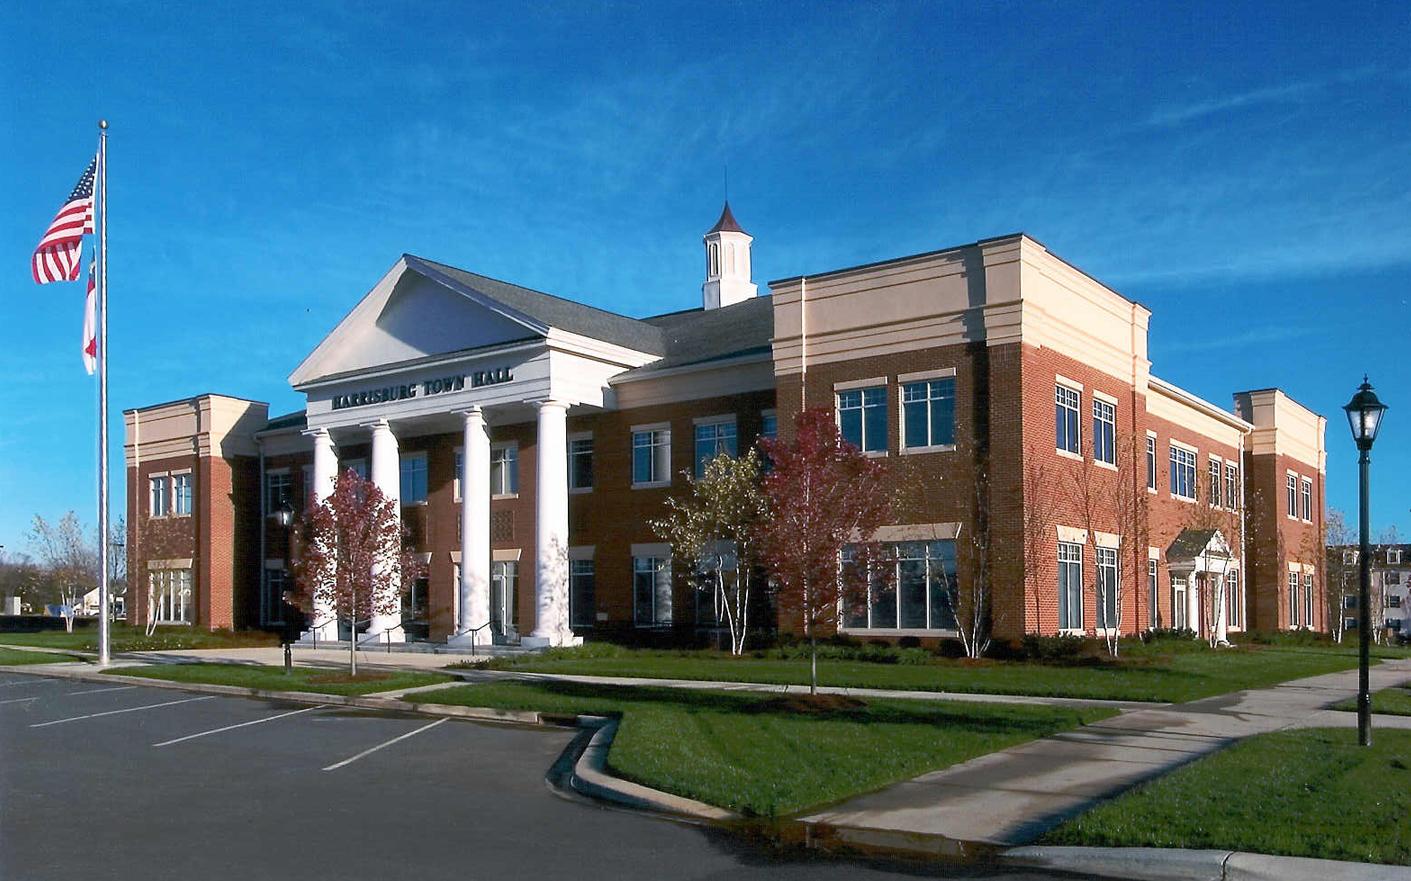 Harrisburg Town Hall